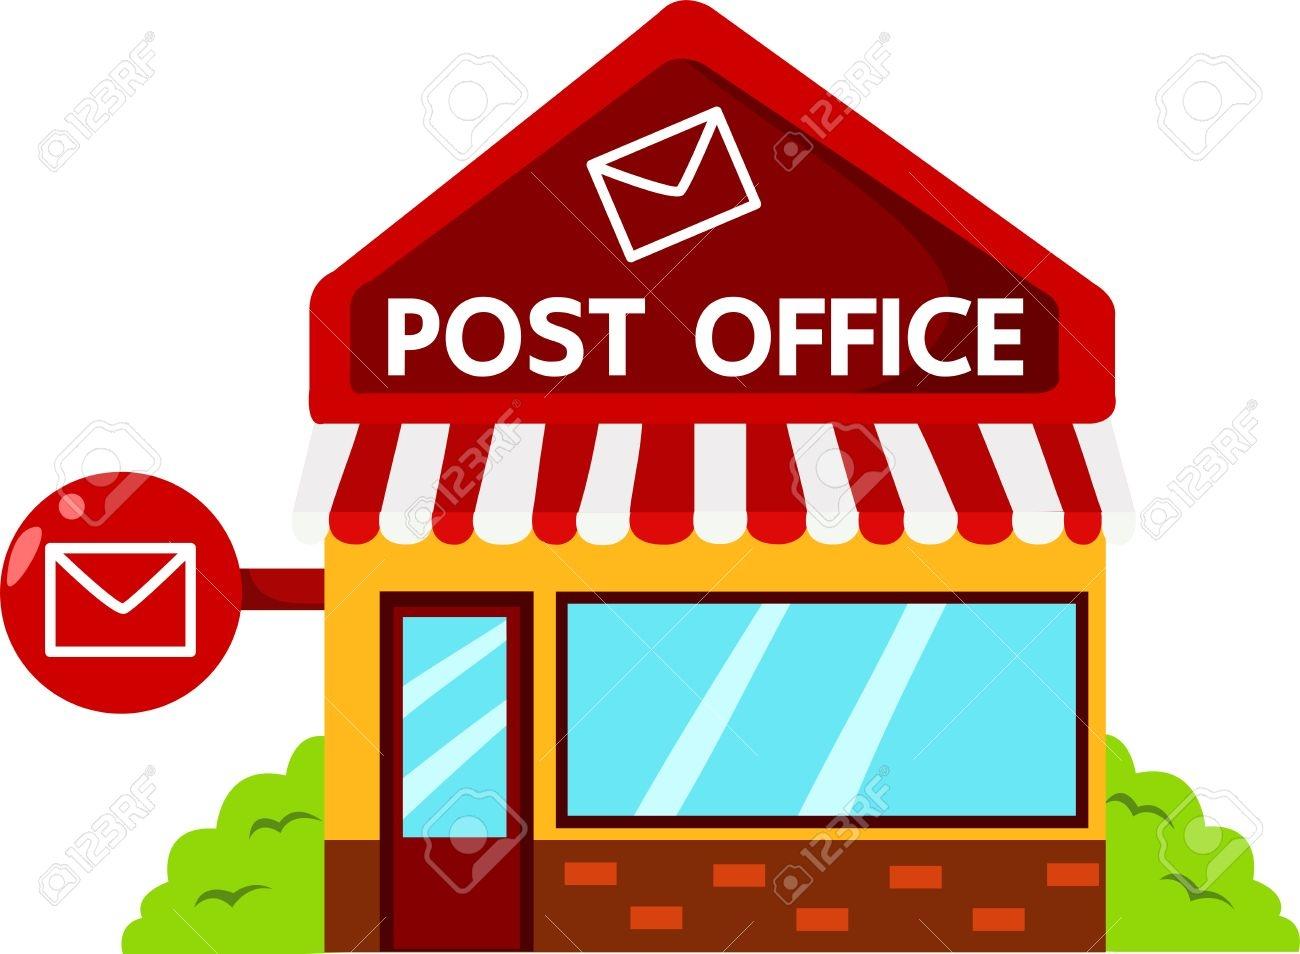 Post office clipart Elegant 47 270 Post fice Cliparts Stock Vector.